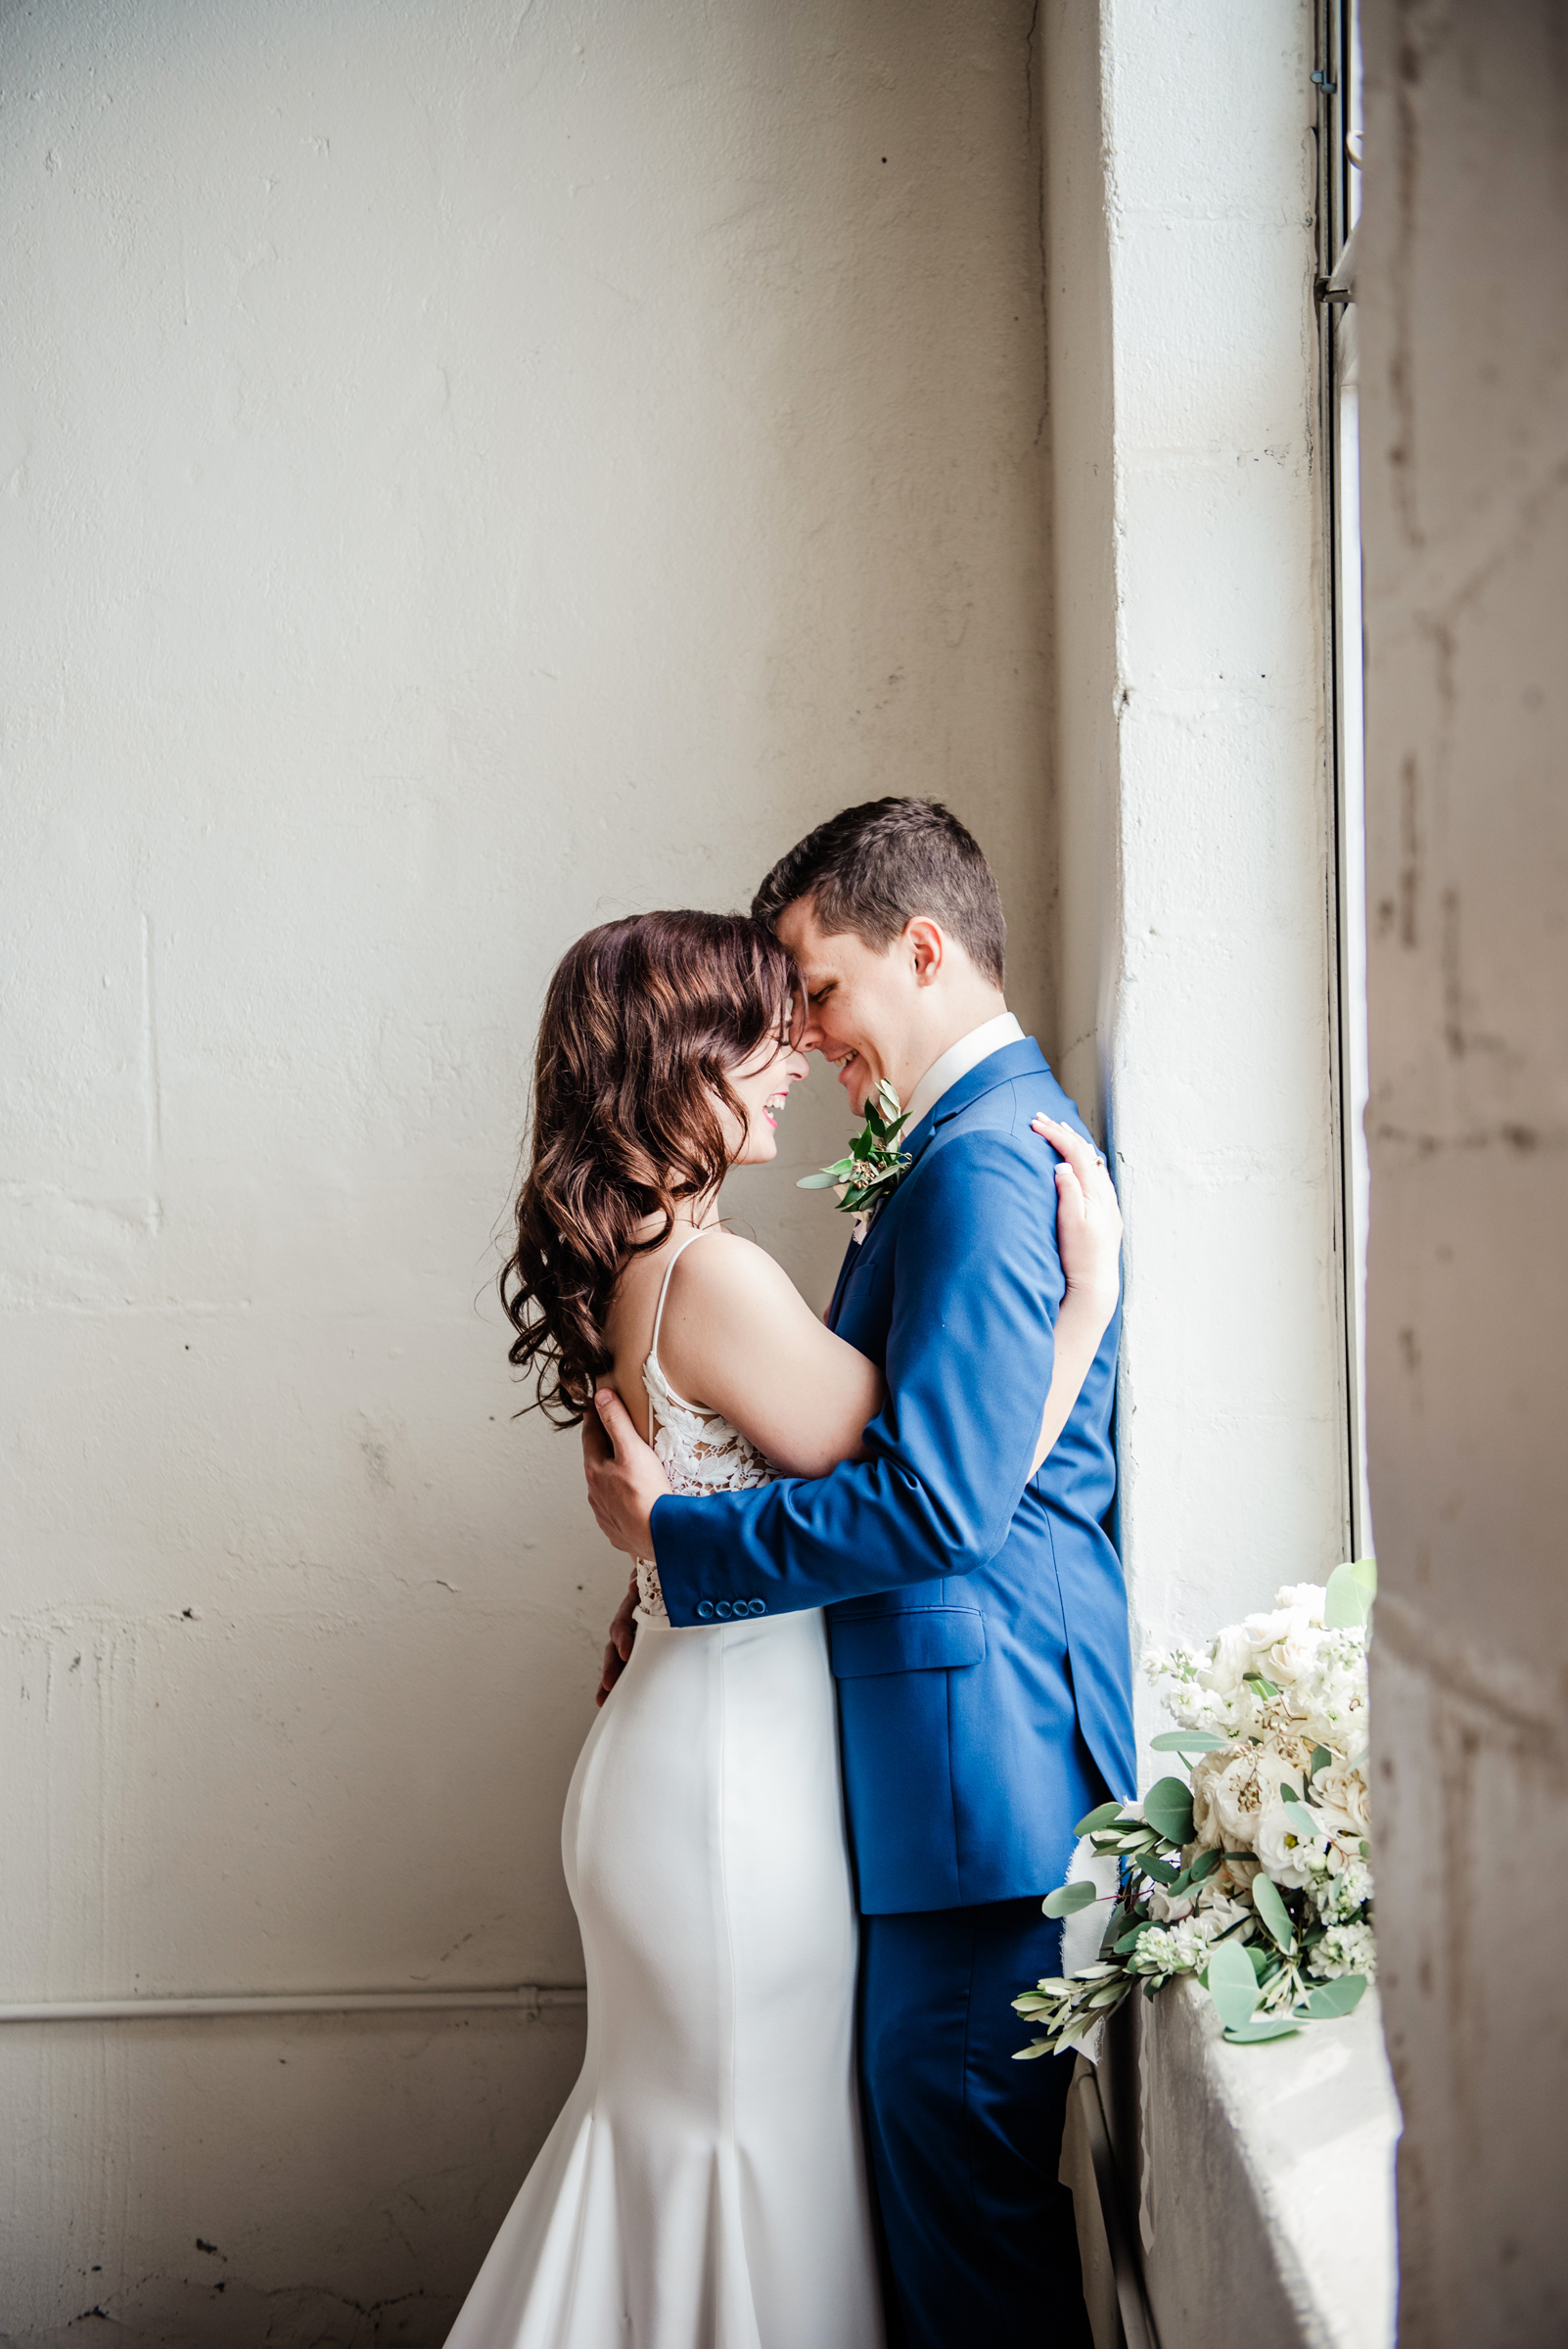 The_Arbor_LoftRochester_Wedding_JILL_STUDIO_Rochester_NY_Photographer_161410.jpg